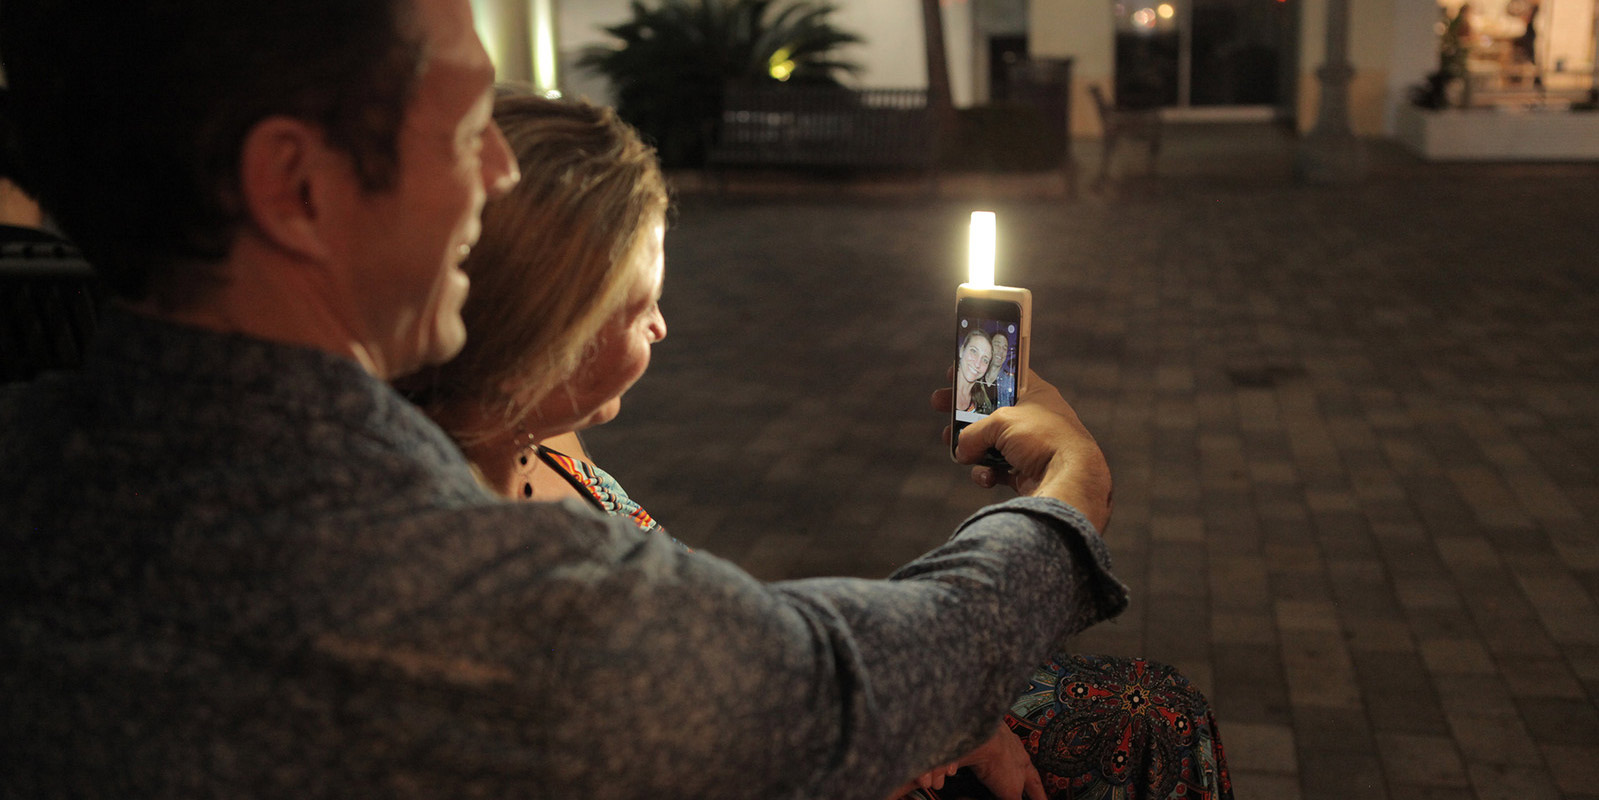 lampe-panda-iphone-selfie-chasseursdecool-home